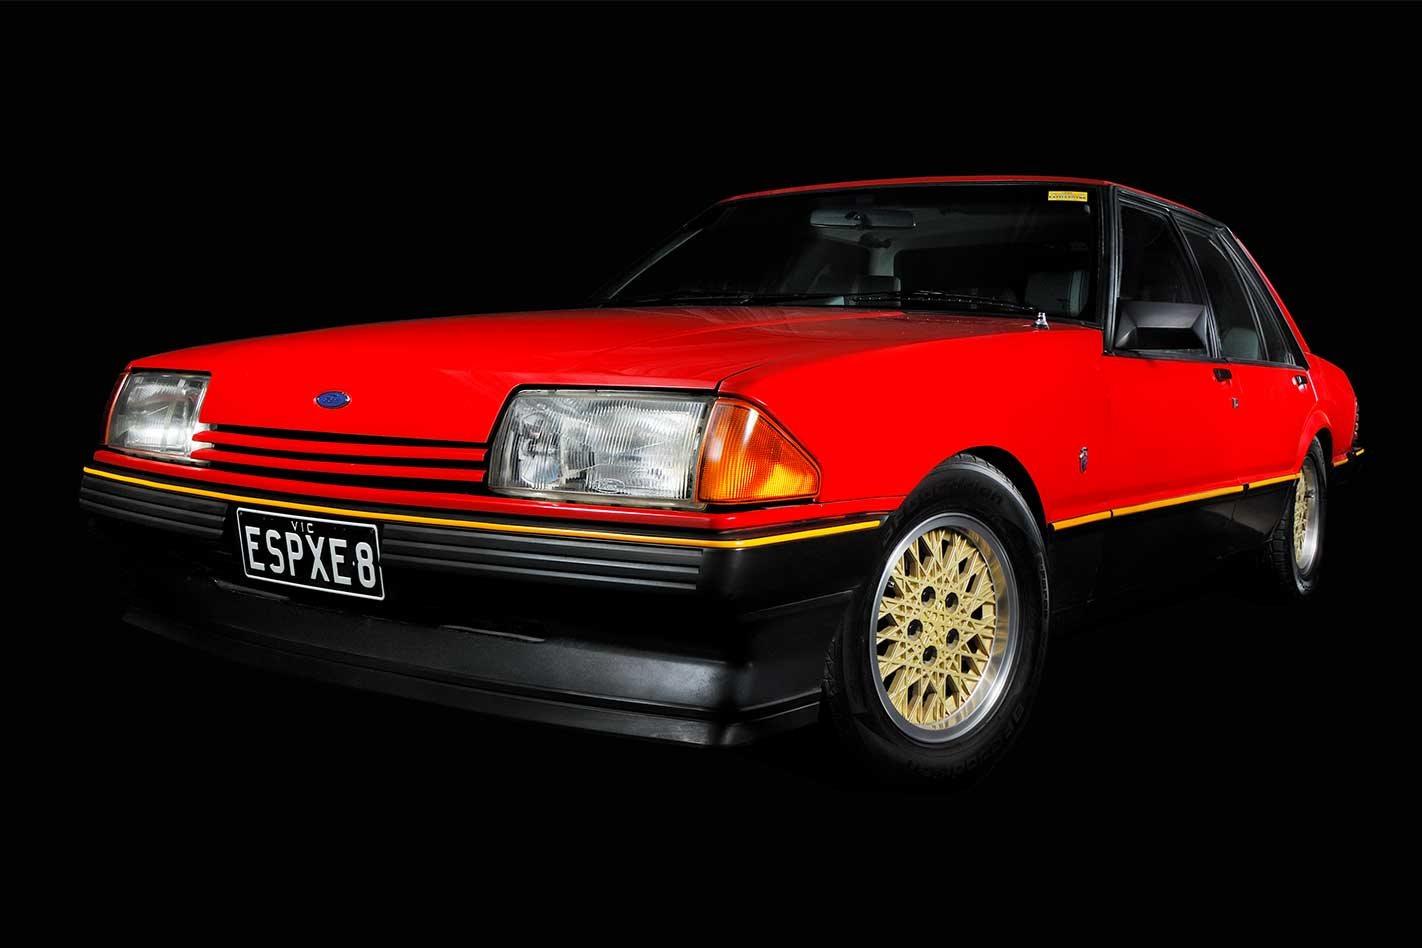 1982 Ford Falcon XE ESP: Legend Series